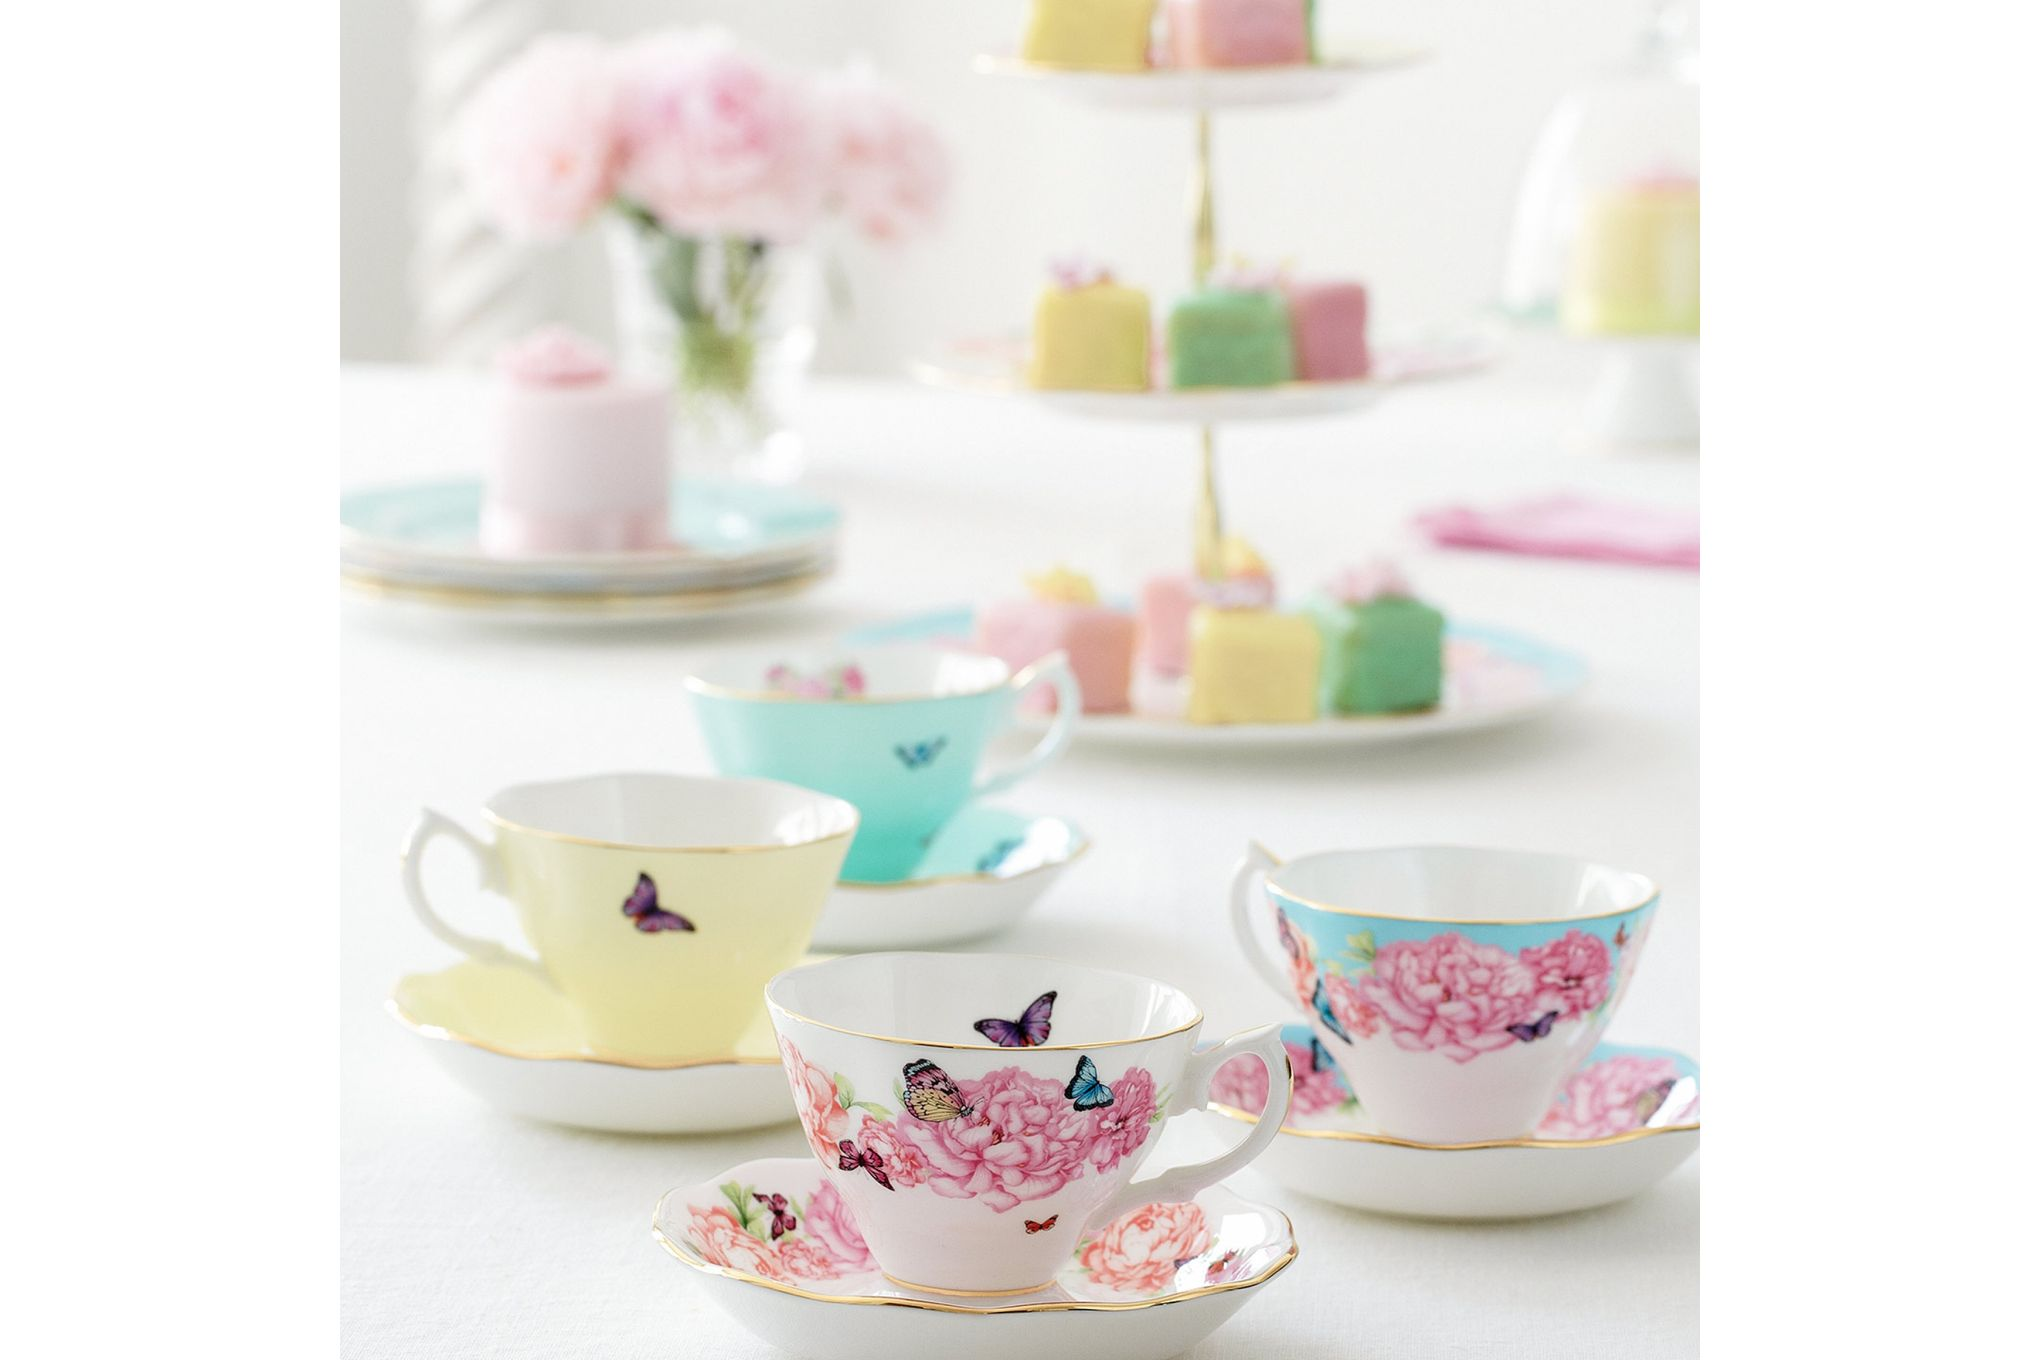 Miranda Kerr for Royal Albert Gift Sets 3 Tier Cake Stand thumb 4